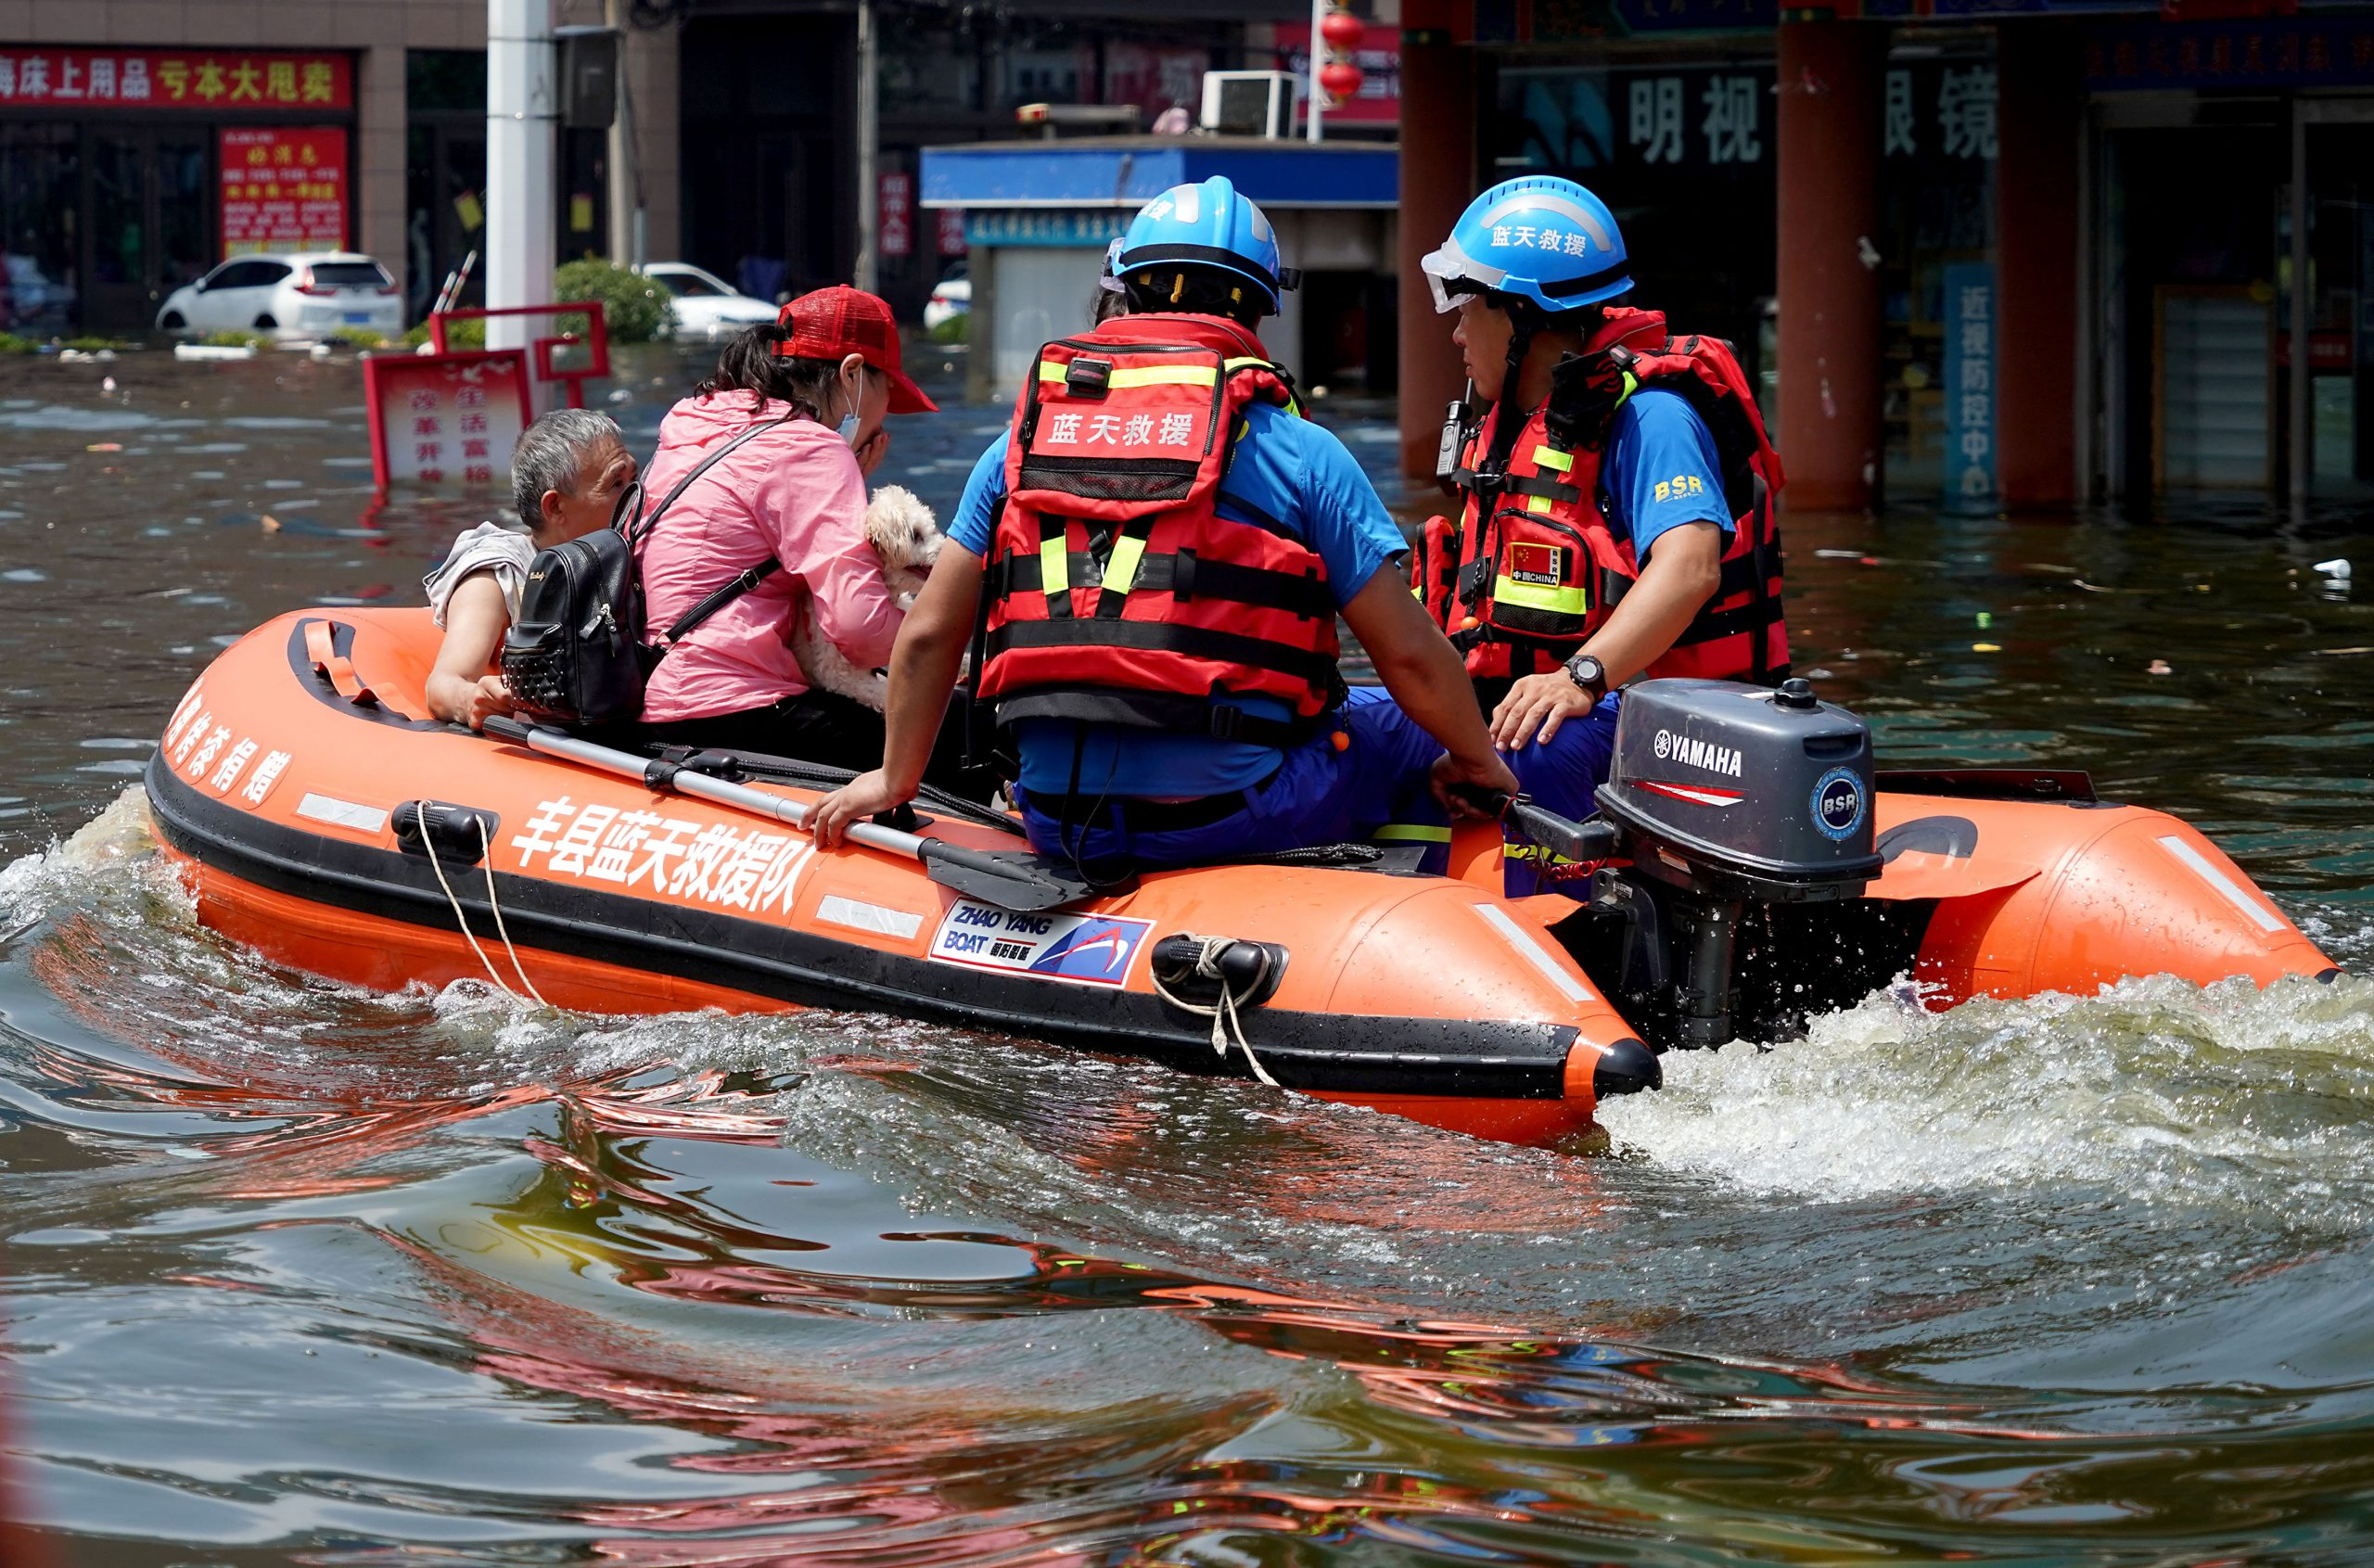 Asciende a 71 número de fallecidos por fuertes lluvias en provincia china de Henan